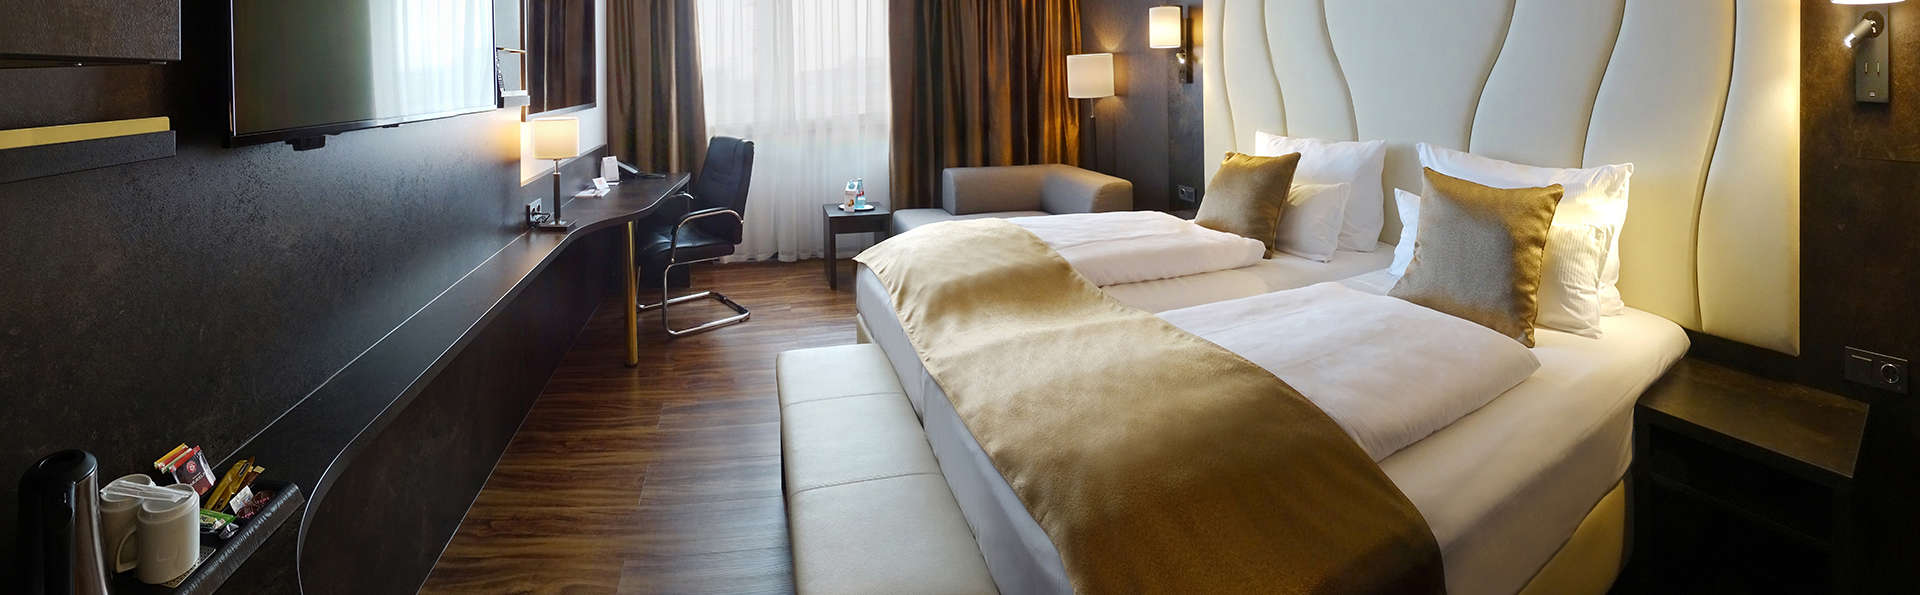 Best Western Plus Plaza Hotel Darmstadt - EDIT_NEW_Suite6.jpg